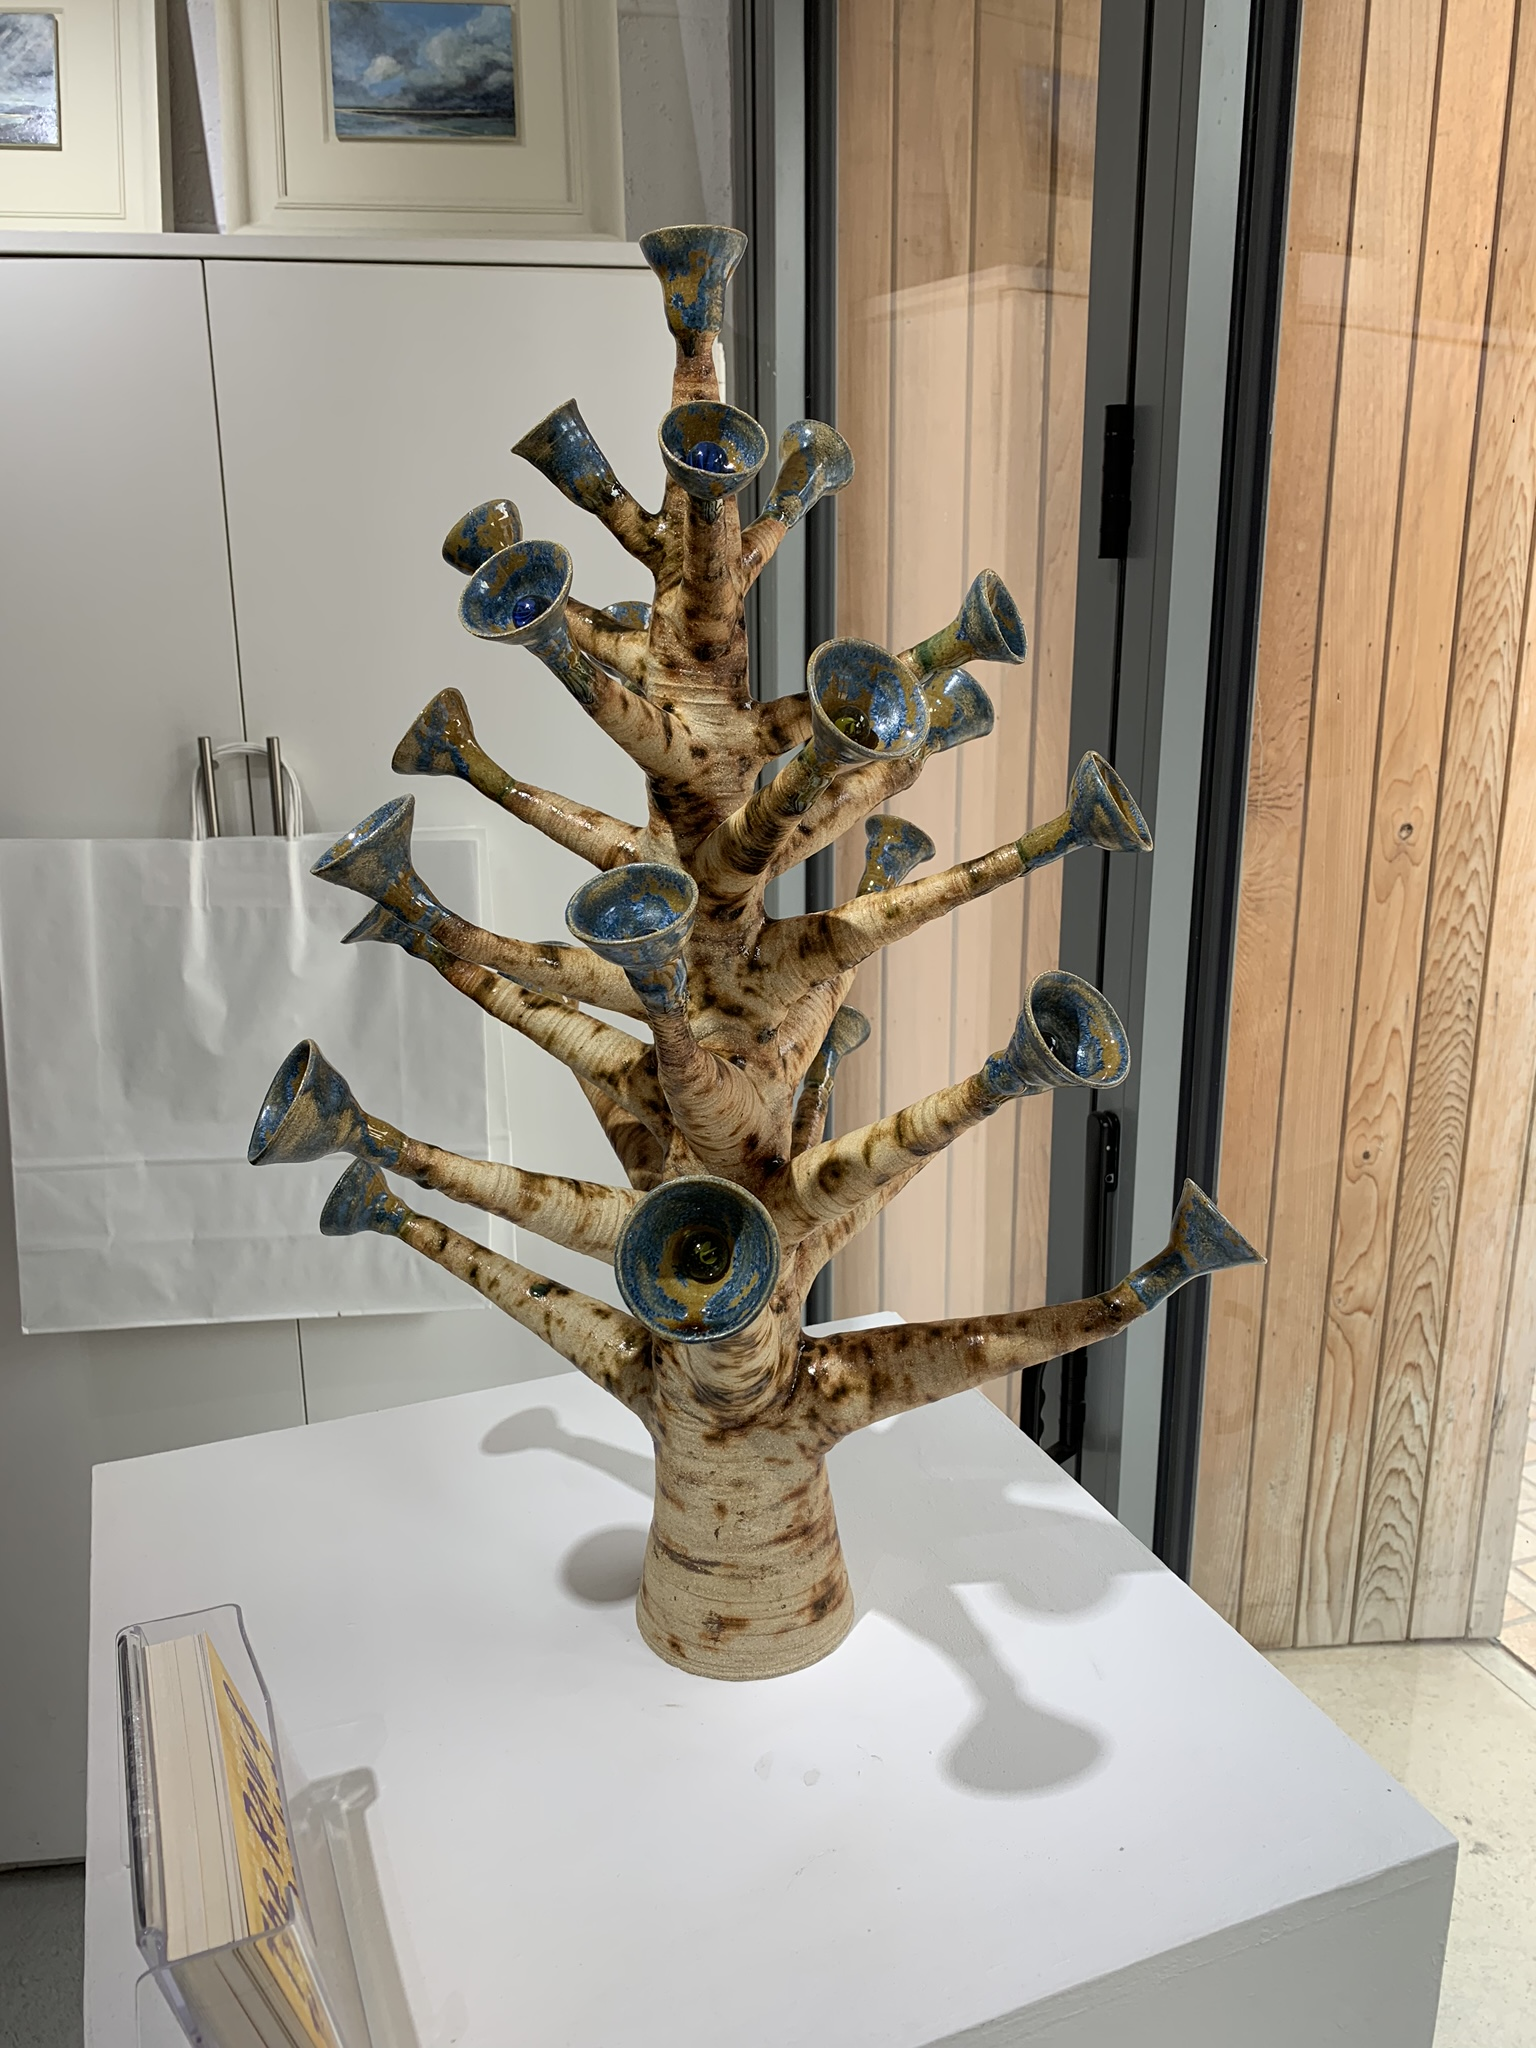 Ceramic plant-like creation